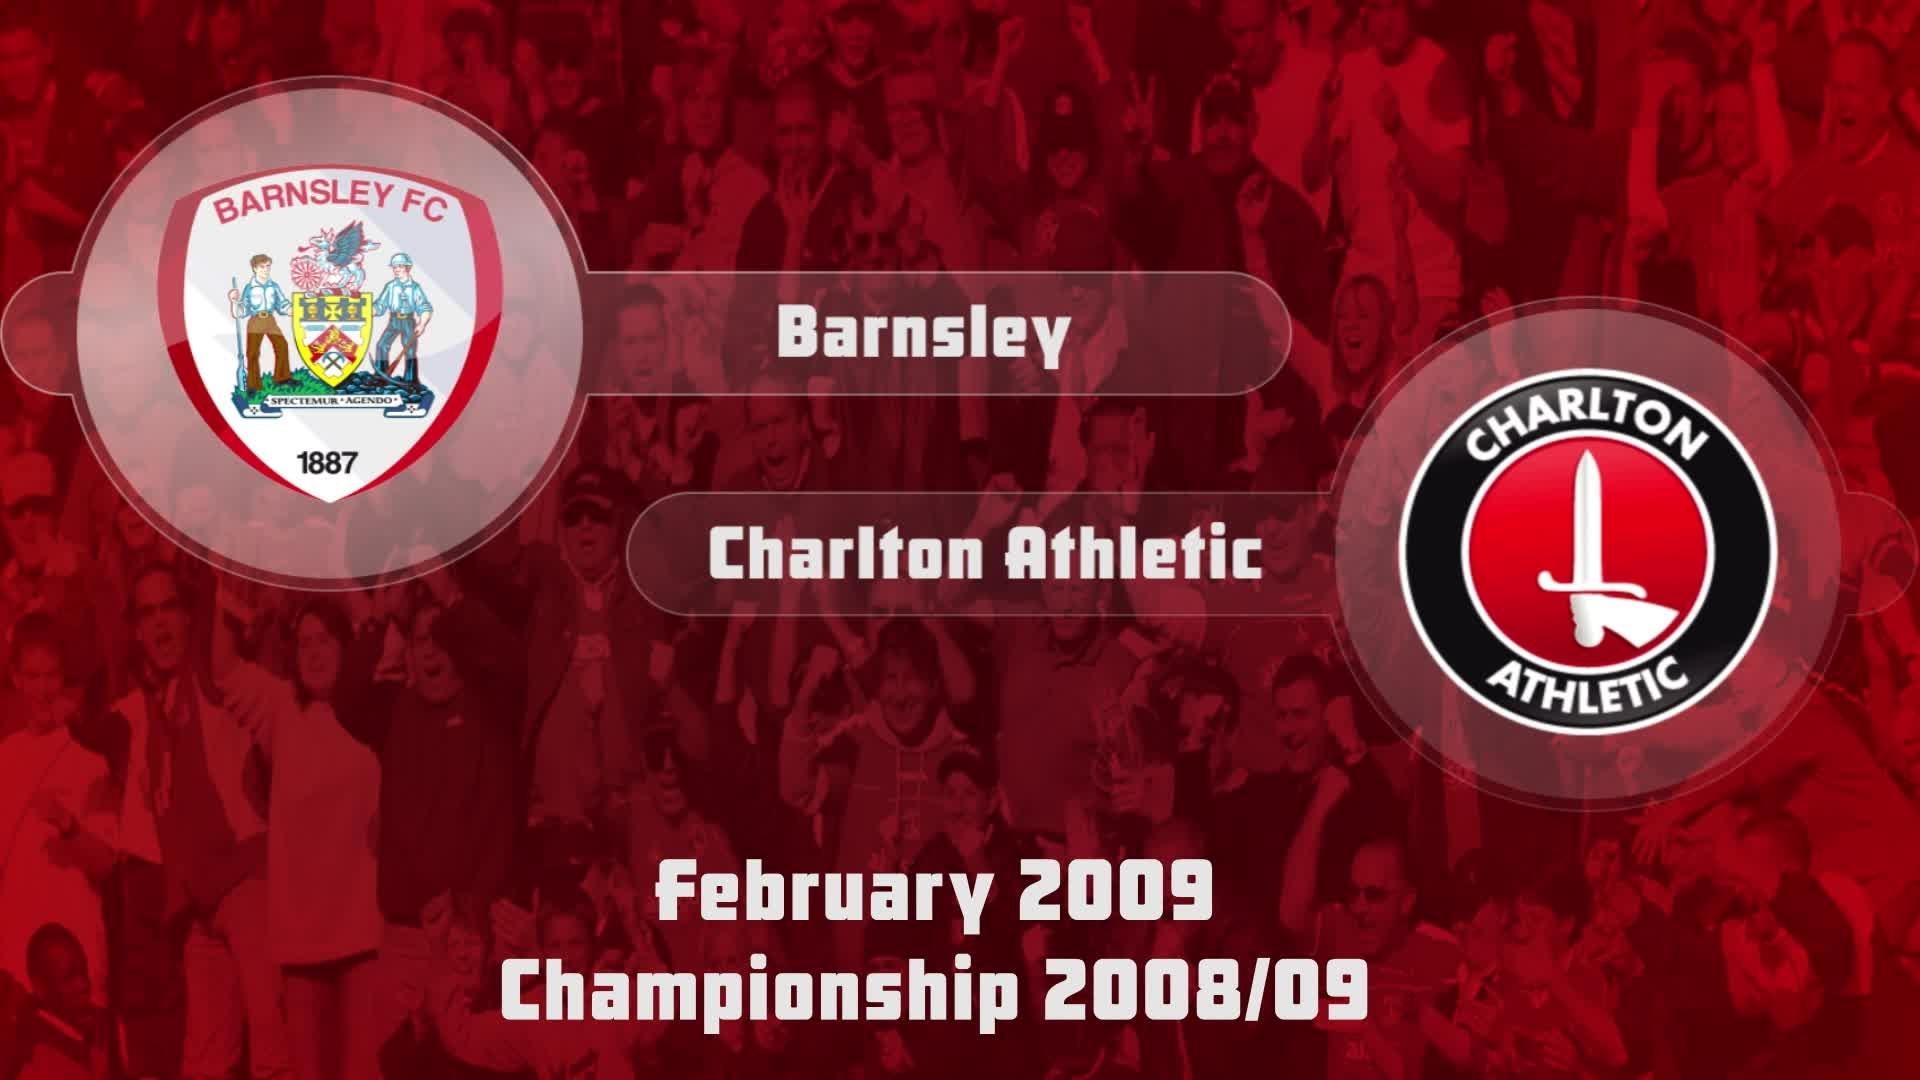 37 HIGHLIGHTS | Barnsley 0 Charlton 0 (Feb 2009)